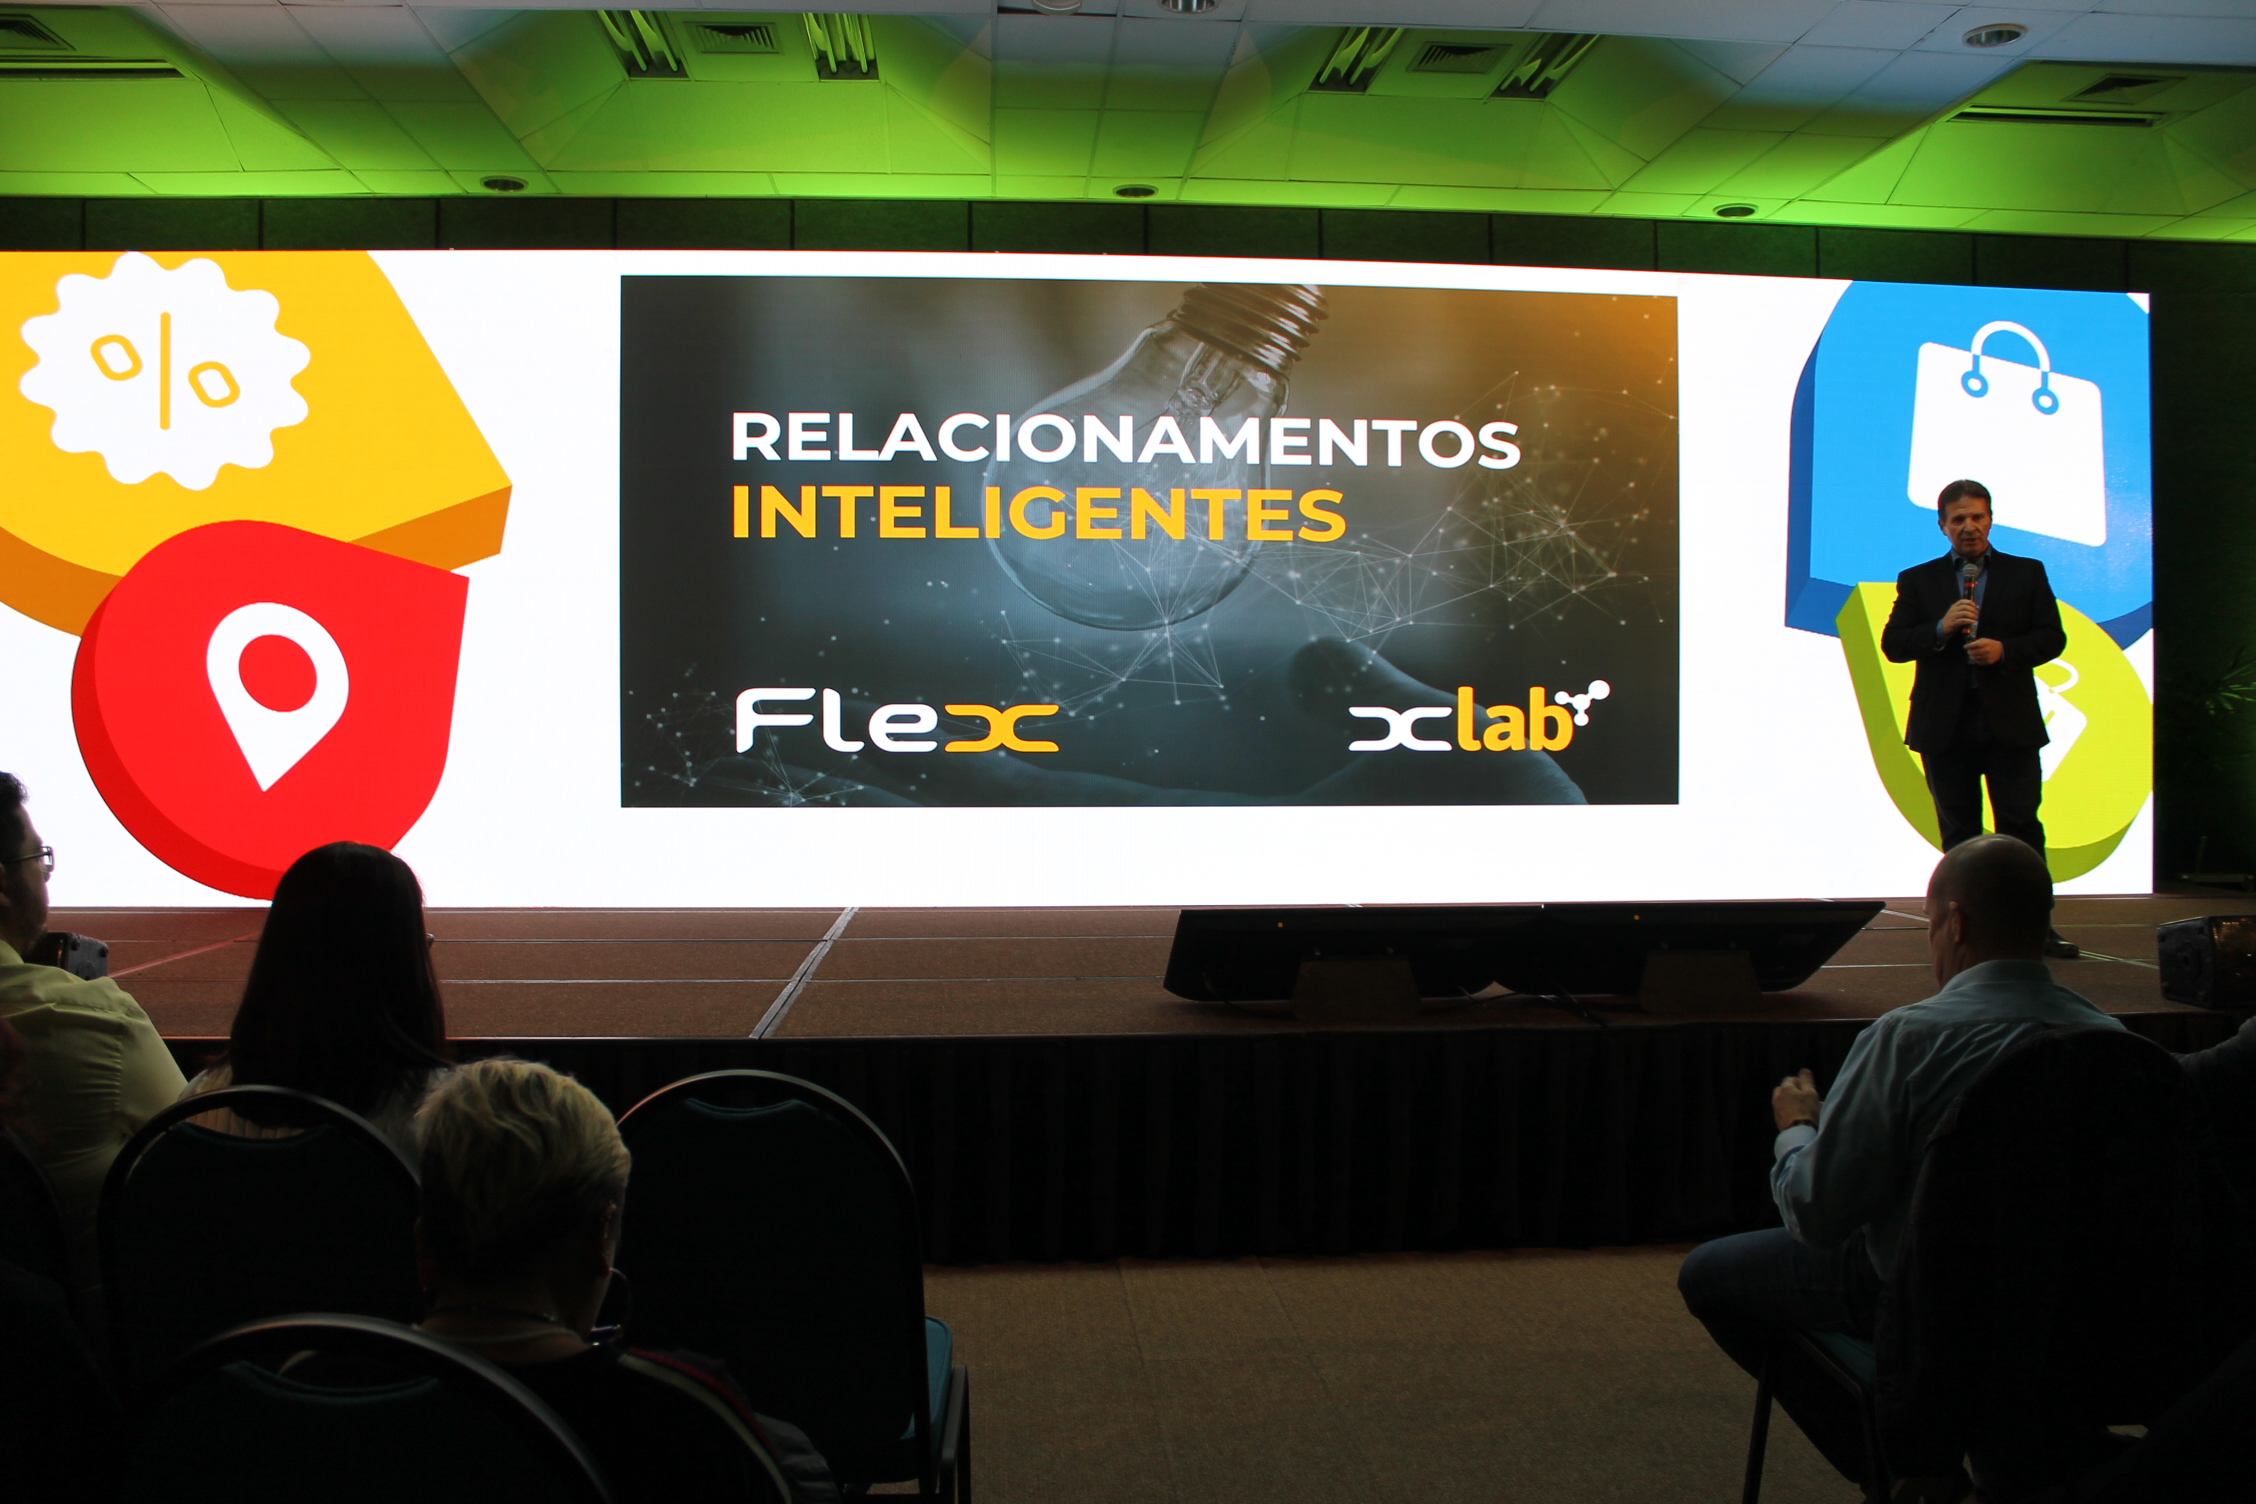 Kleber Bonadia realiza palestra durante Marketing Mix 2018